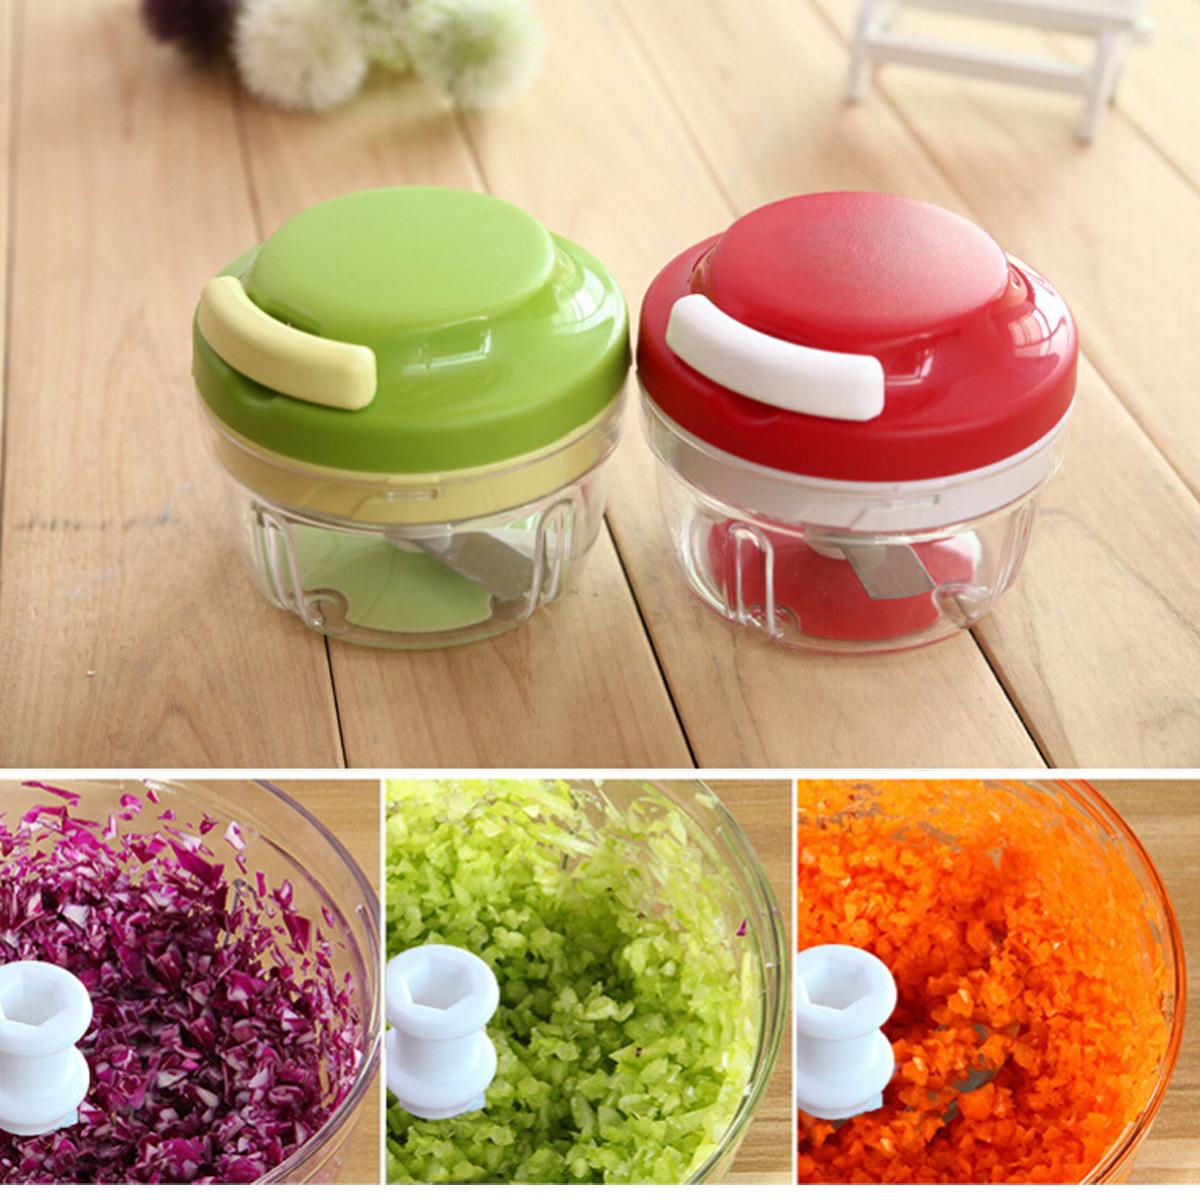 Kitchen Food Chopper Dicer Slicer Meat Cutter Mixer Salad Crusher Kitchen Gadget,红色... by